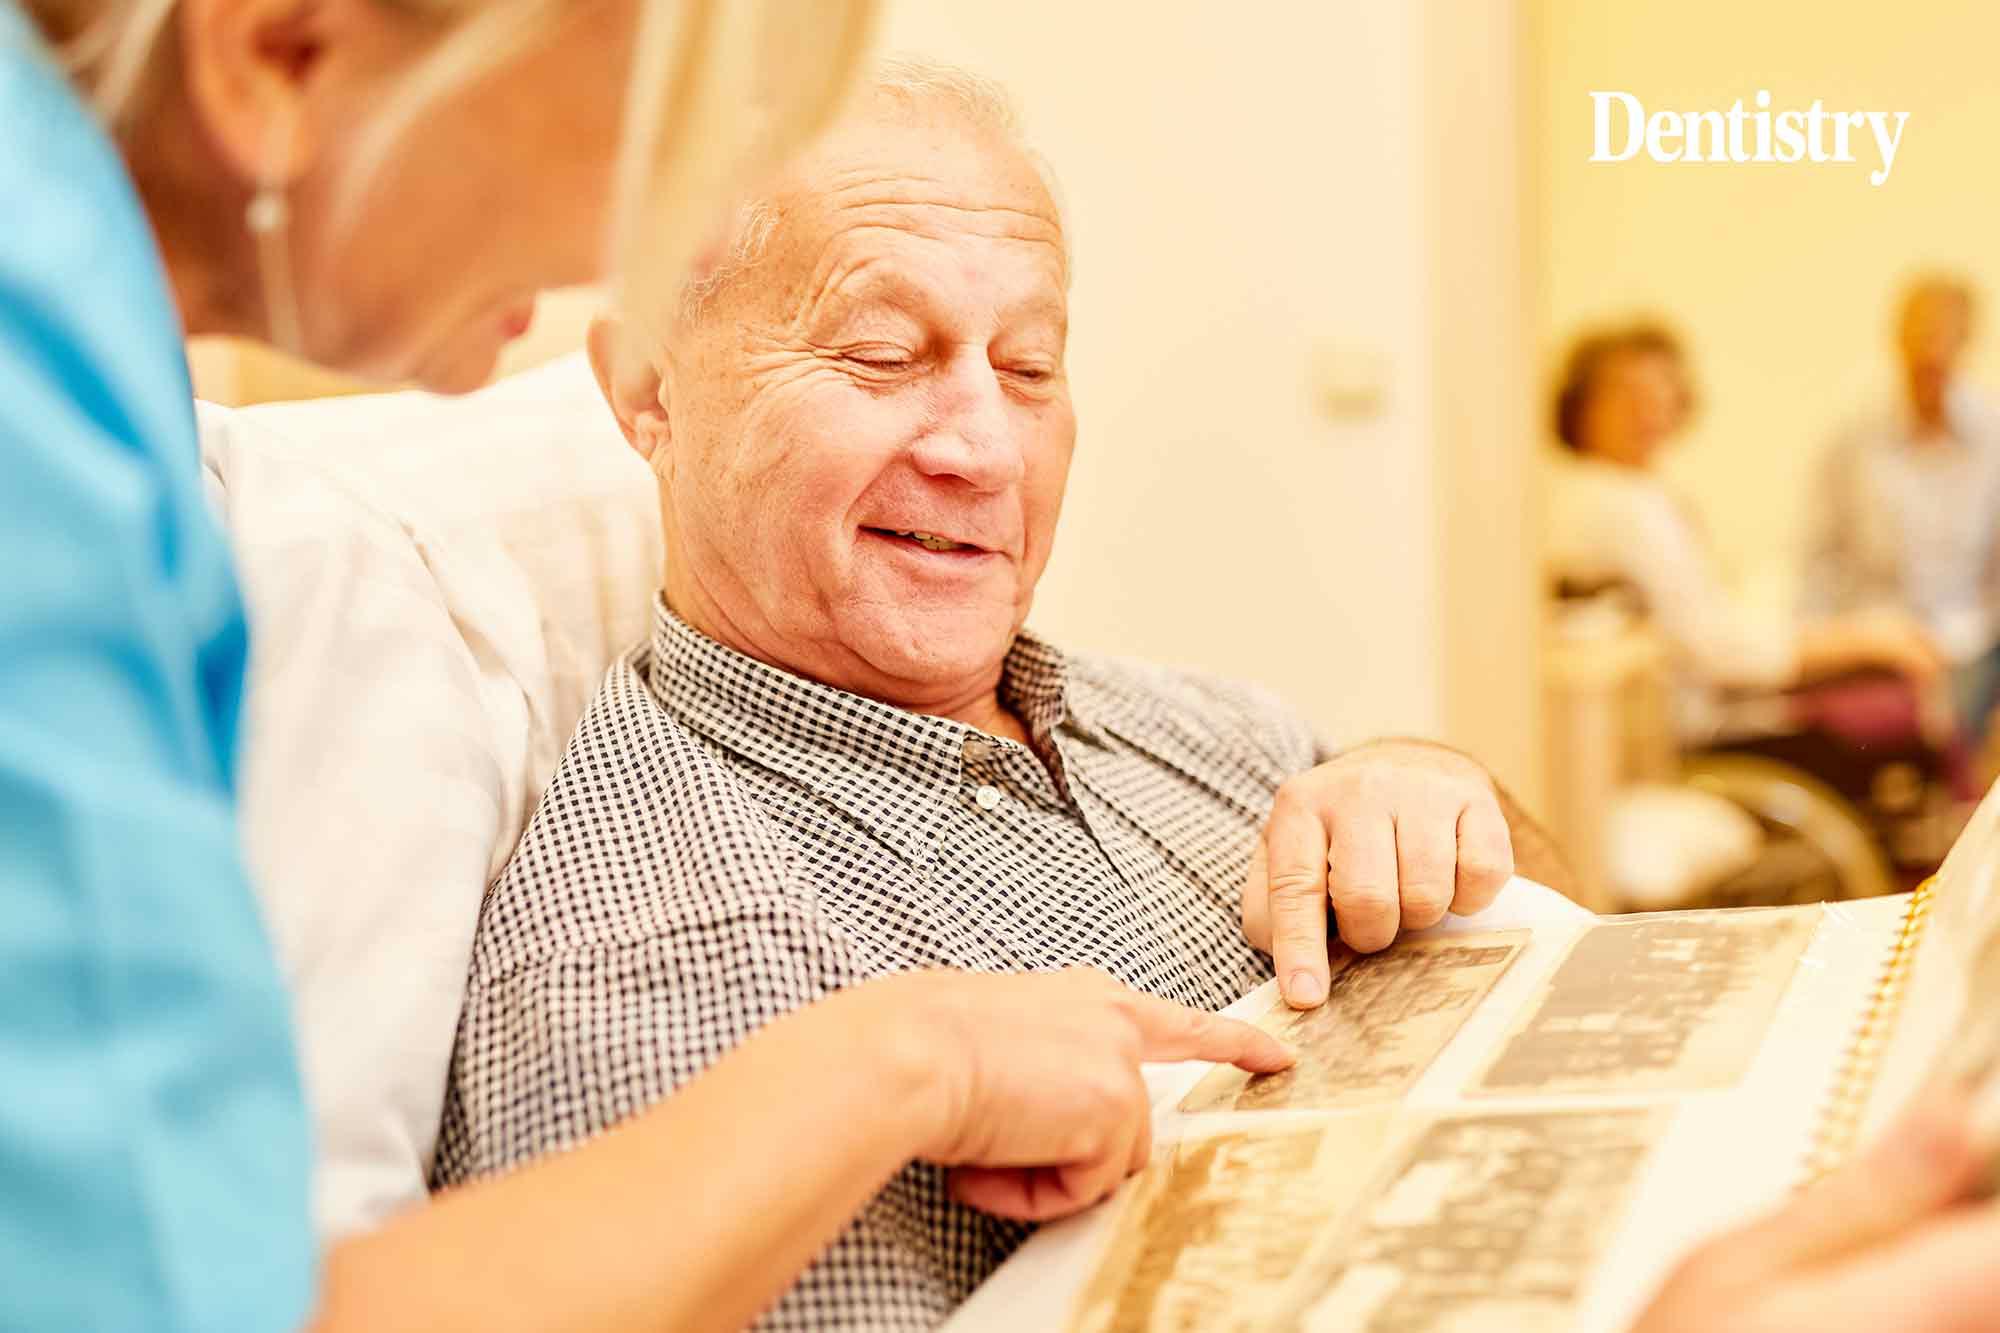 World Alzheimer's Day – is your dental practice dementia-friendly?